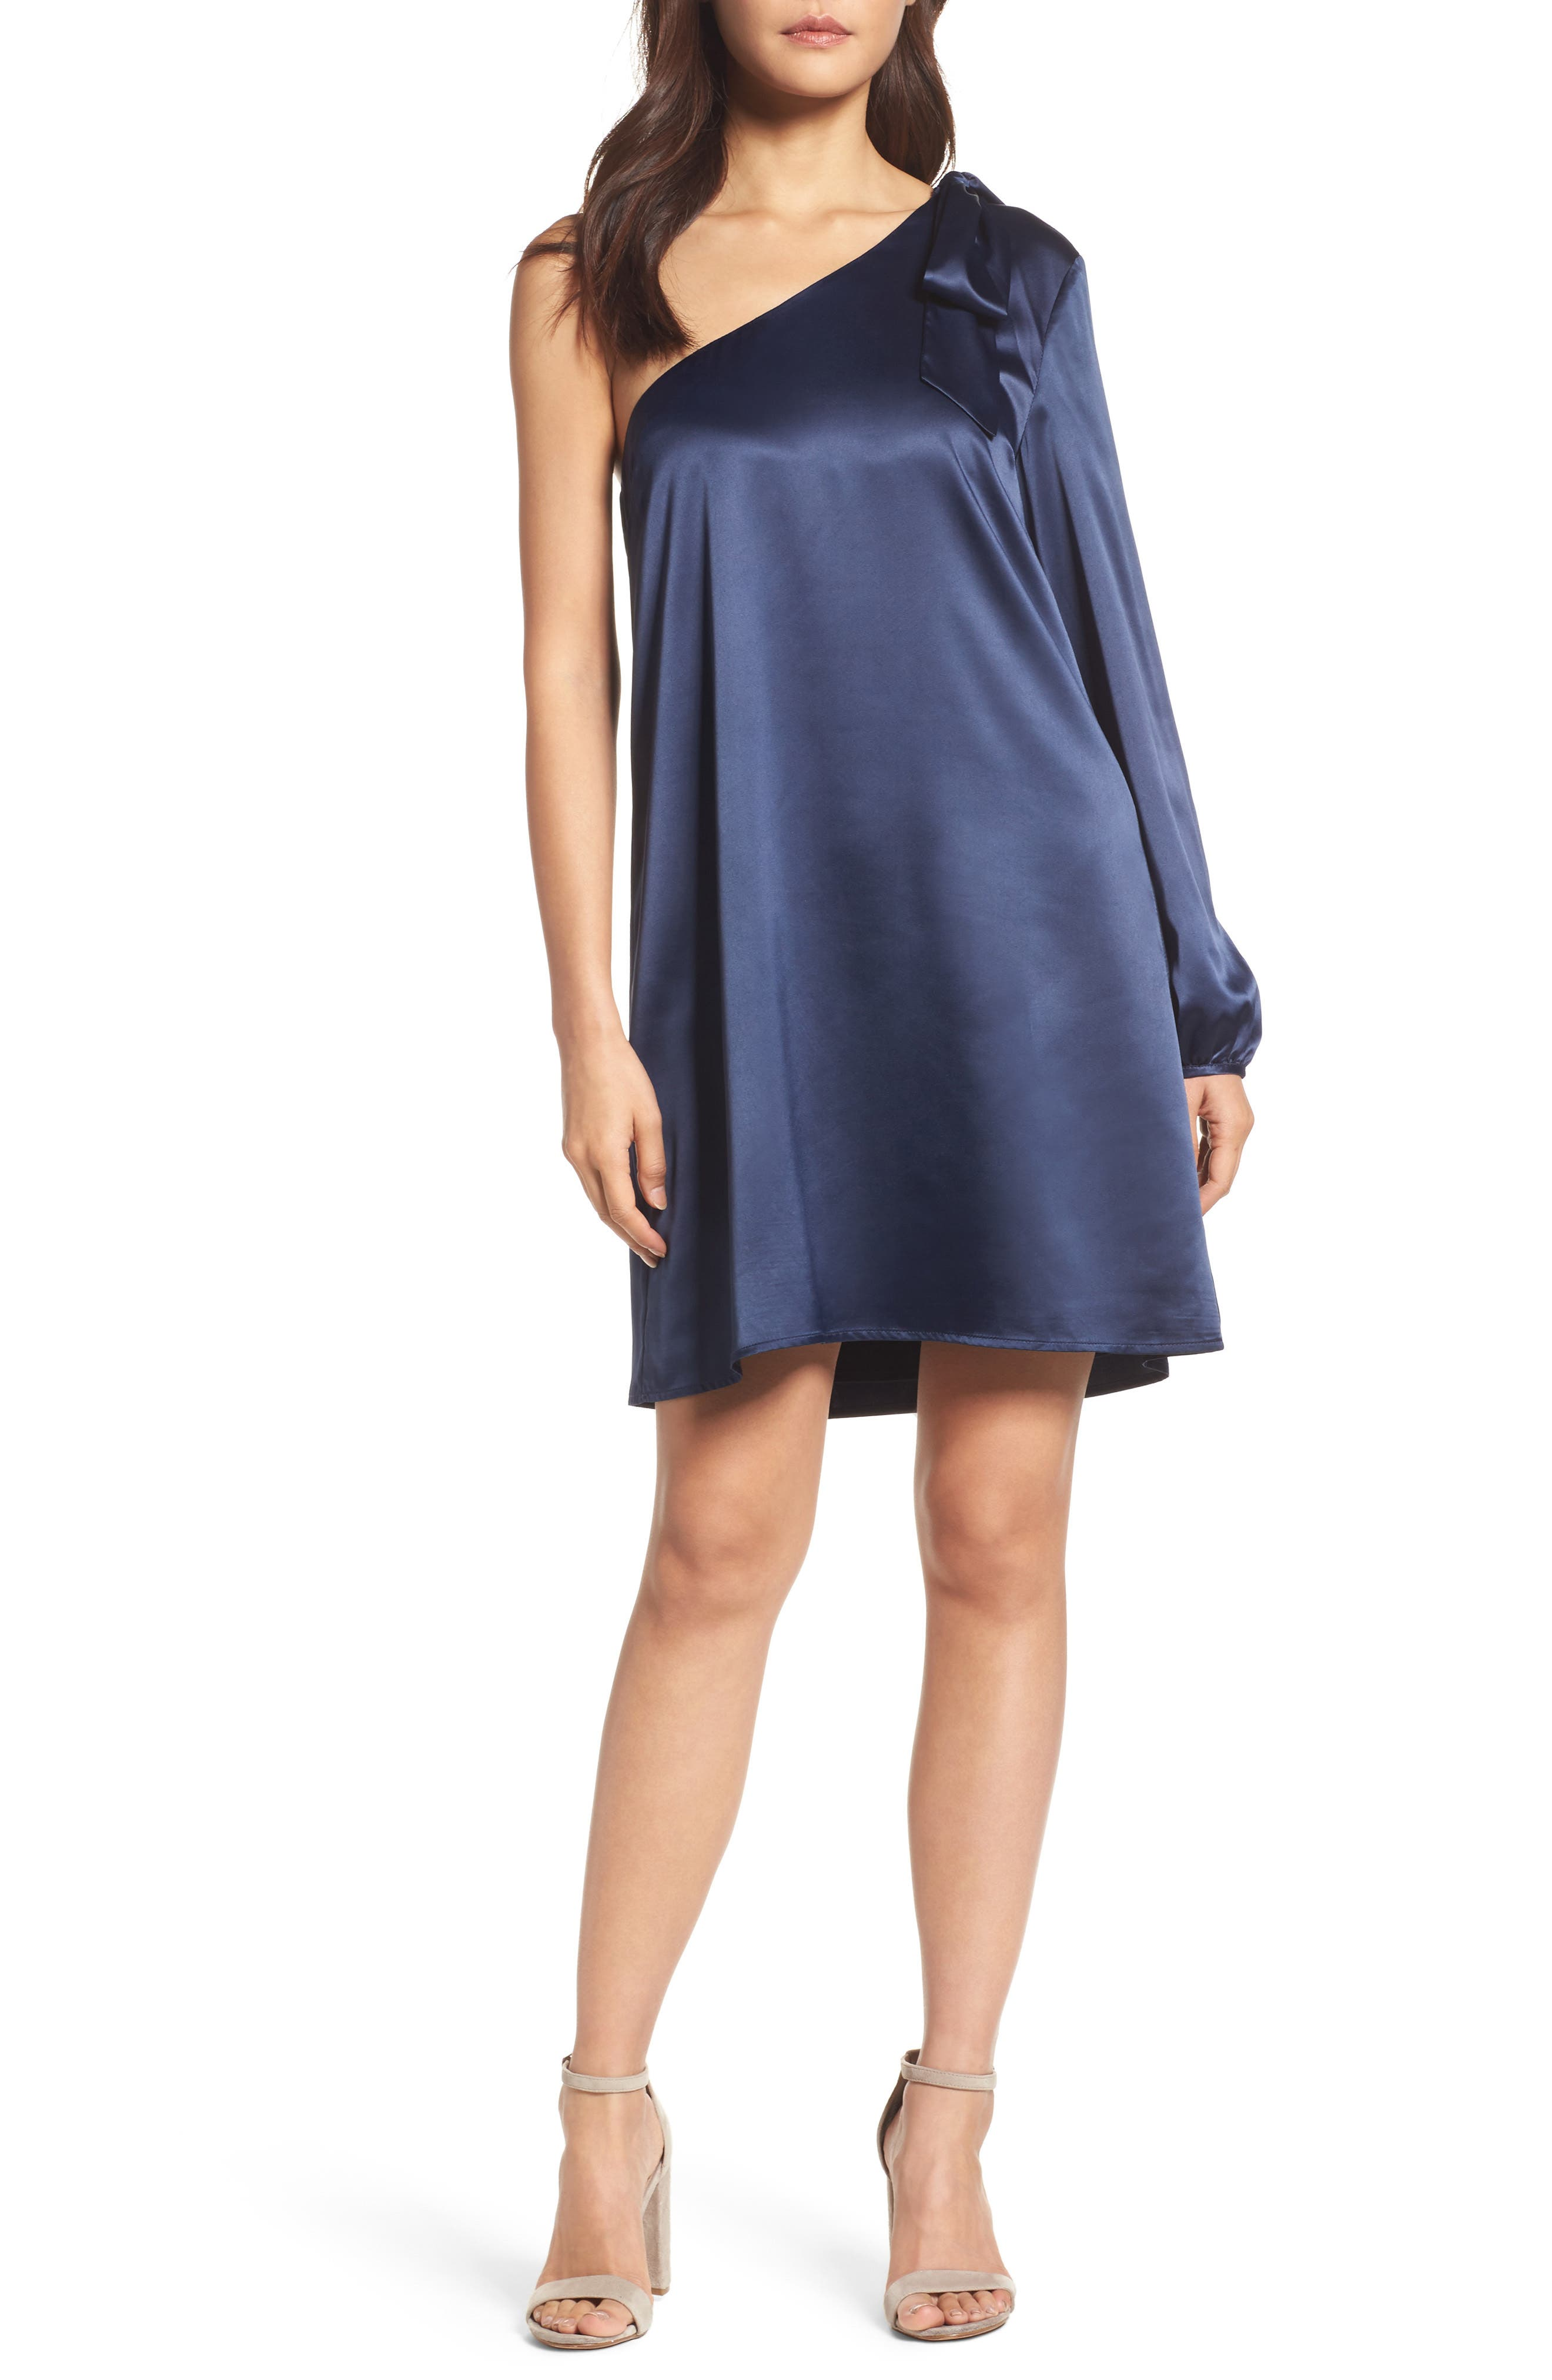 NSR One-Sleeve Shift Dress